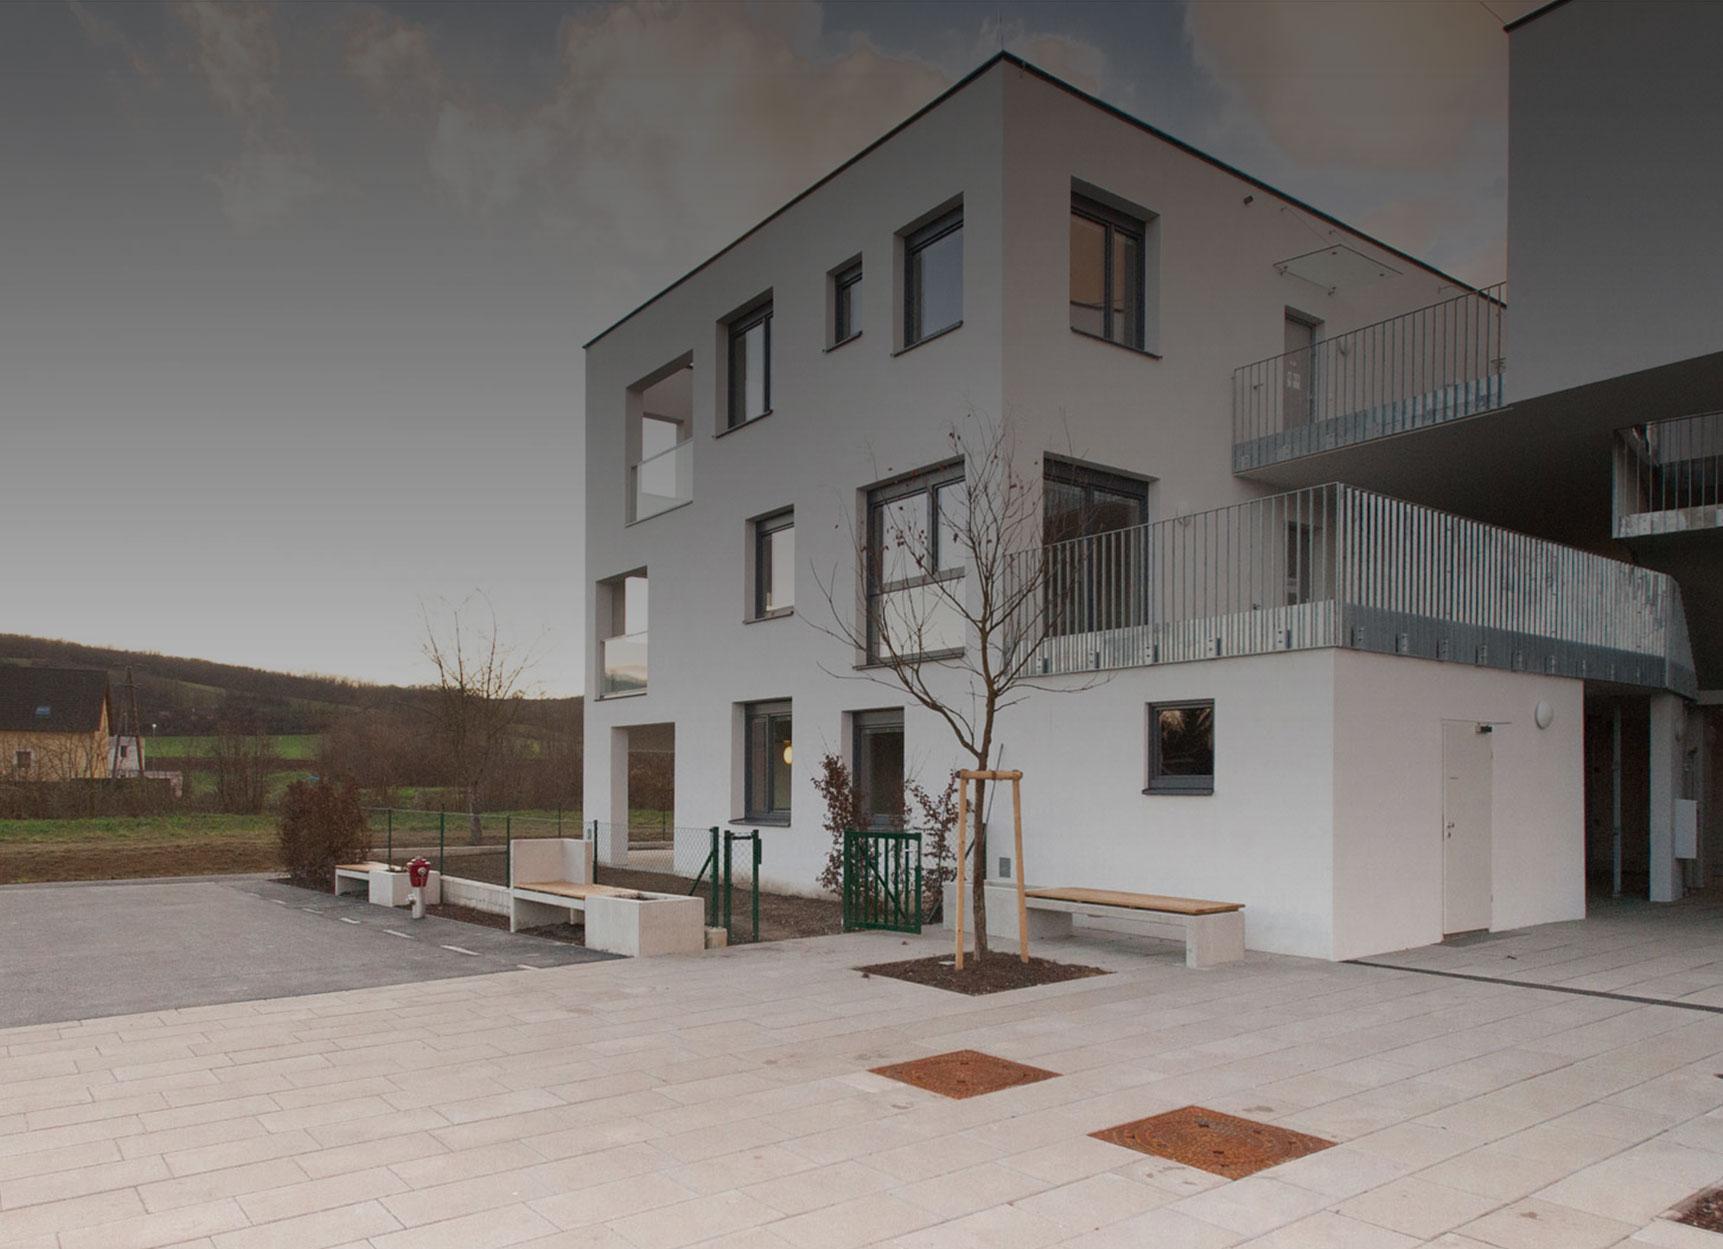 NÖ Wohnbaupreis 2017 | Großweikersdorf